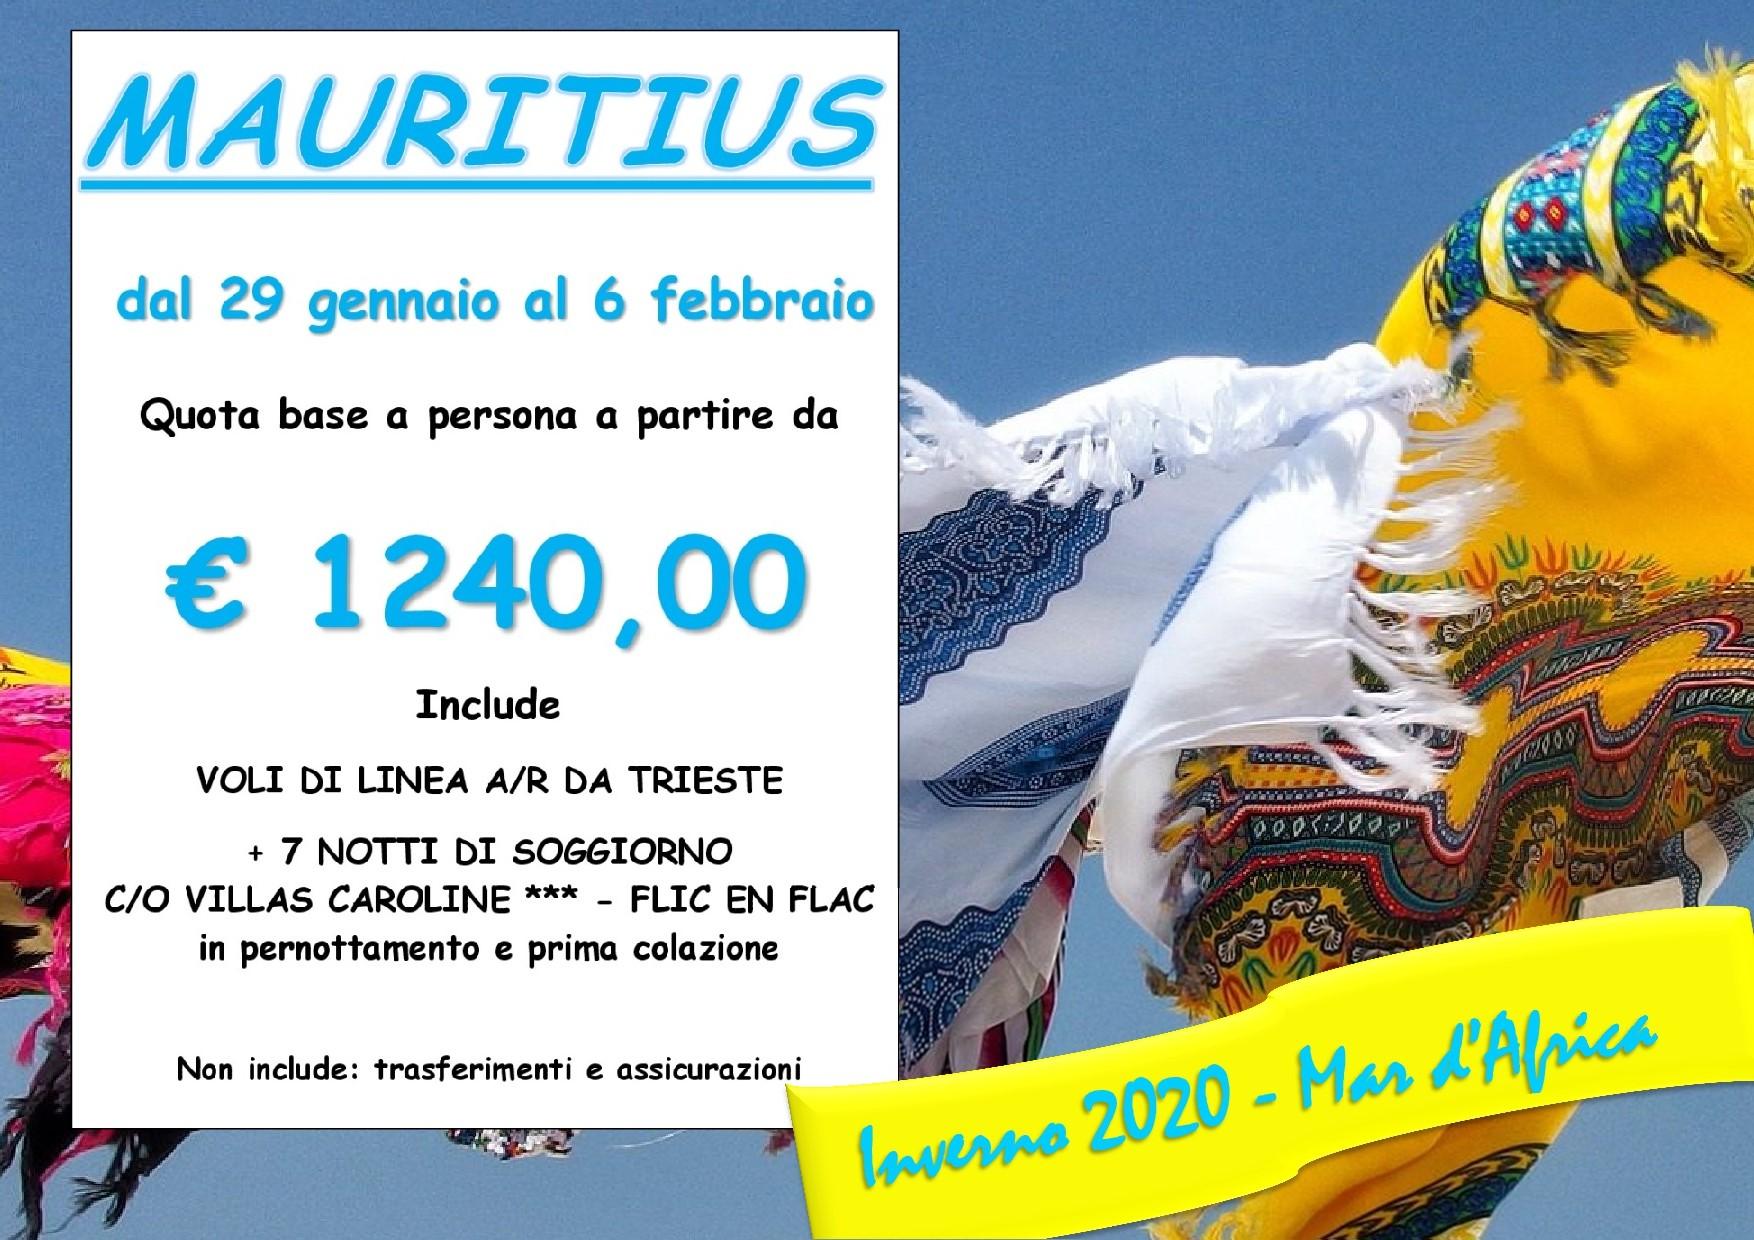 mauritius-orizz